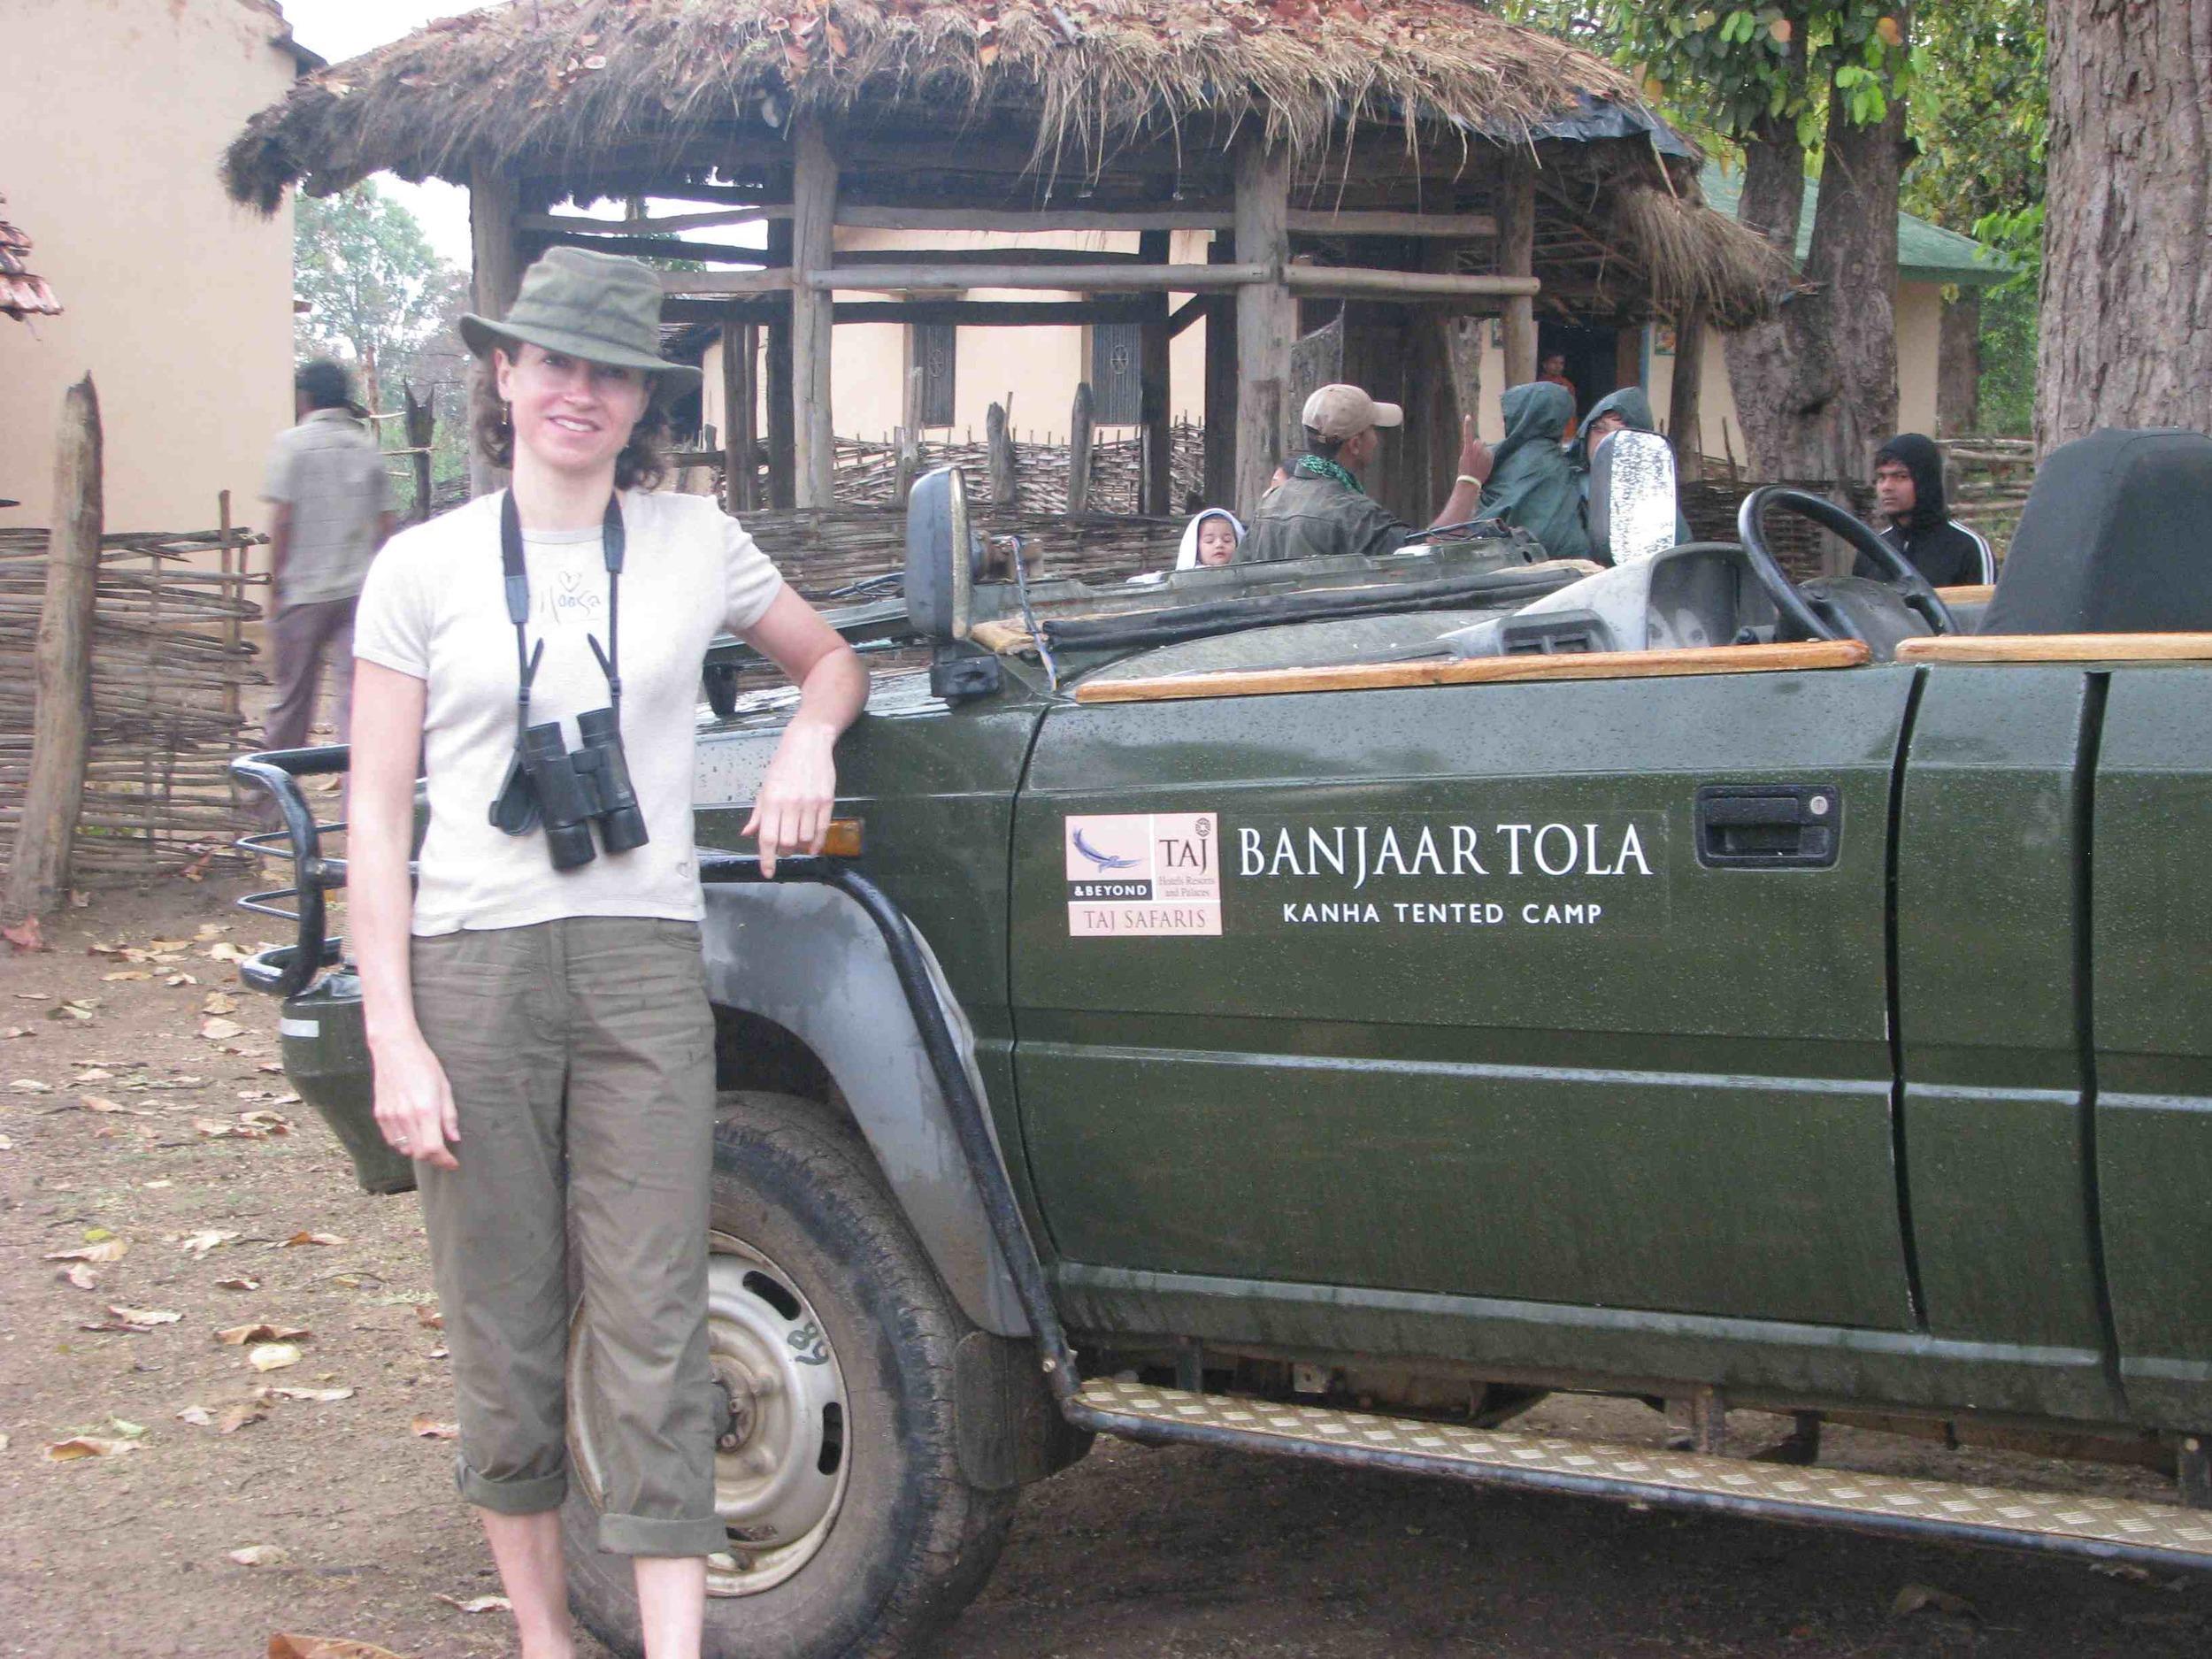 Laura on safari in Central India